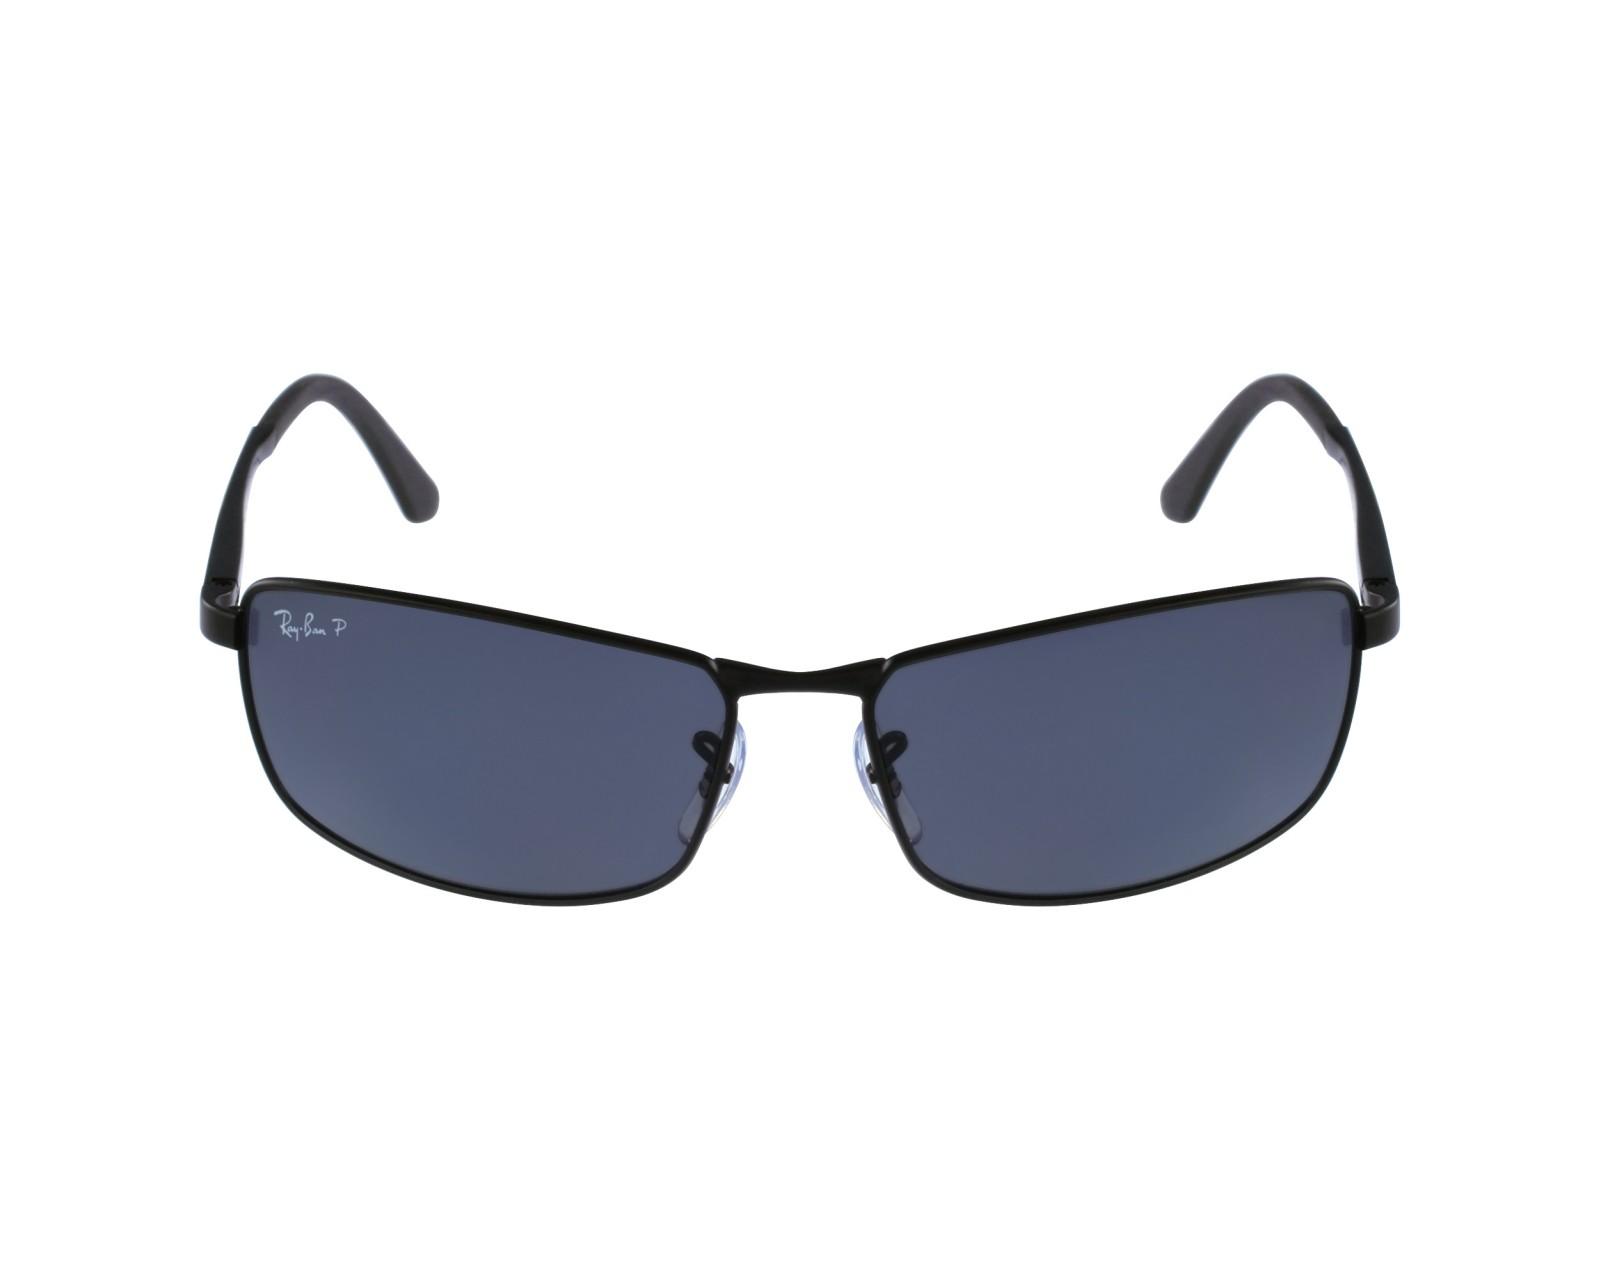 e8a29e9428 Sunglasses Ray-Ban RB-3498 006 81 61-17 Black profile view